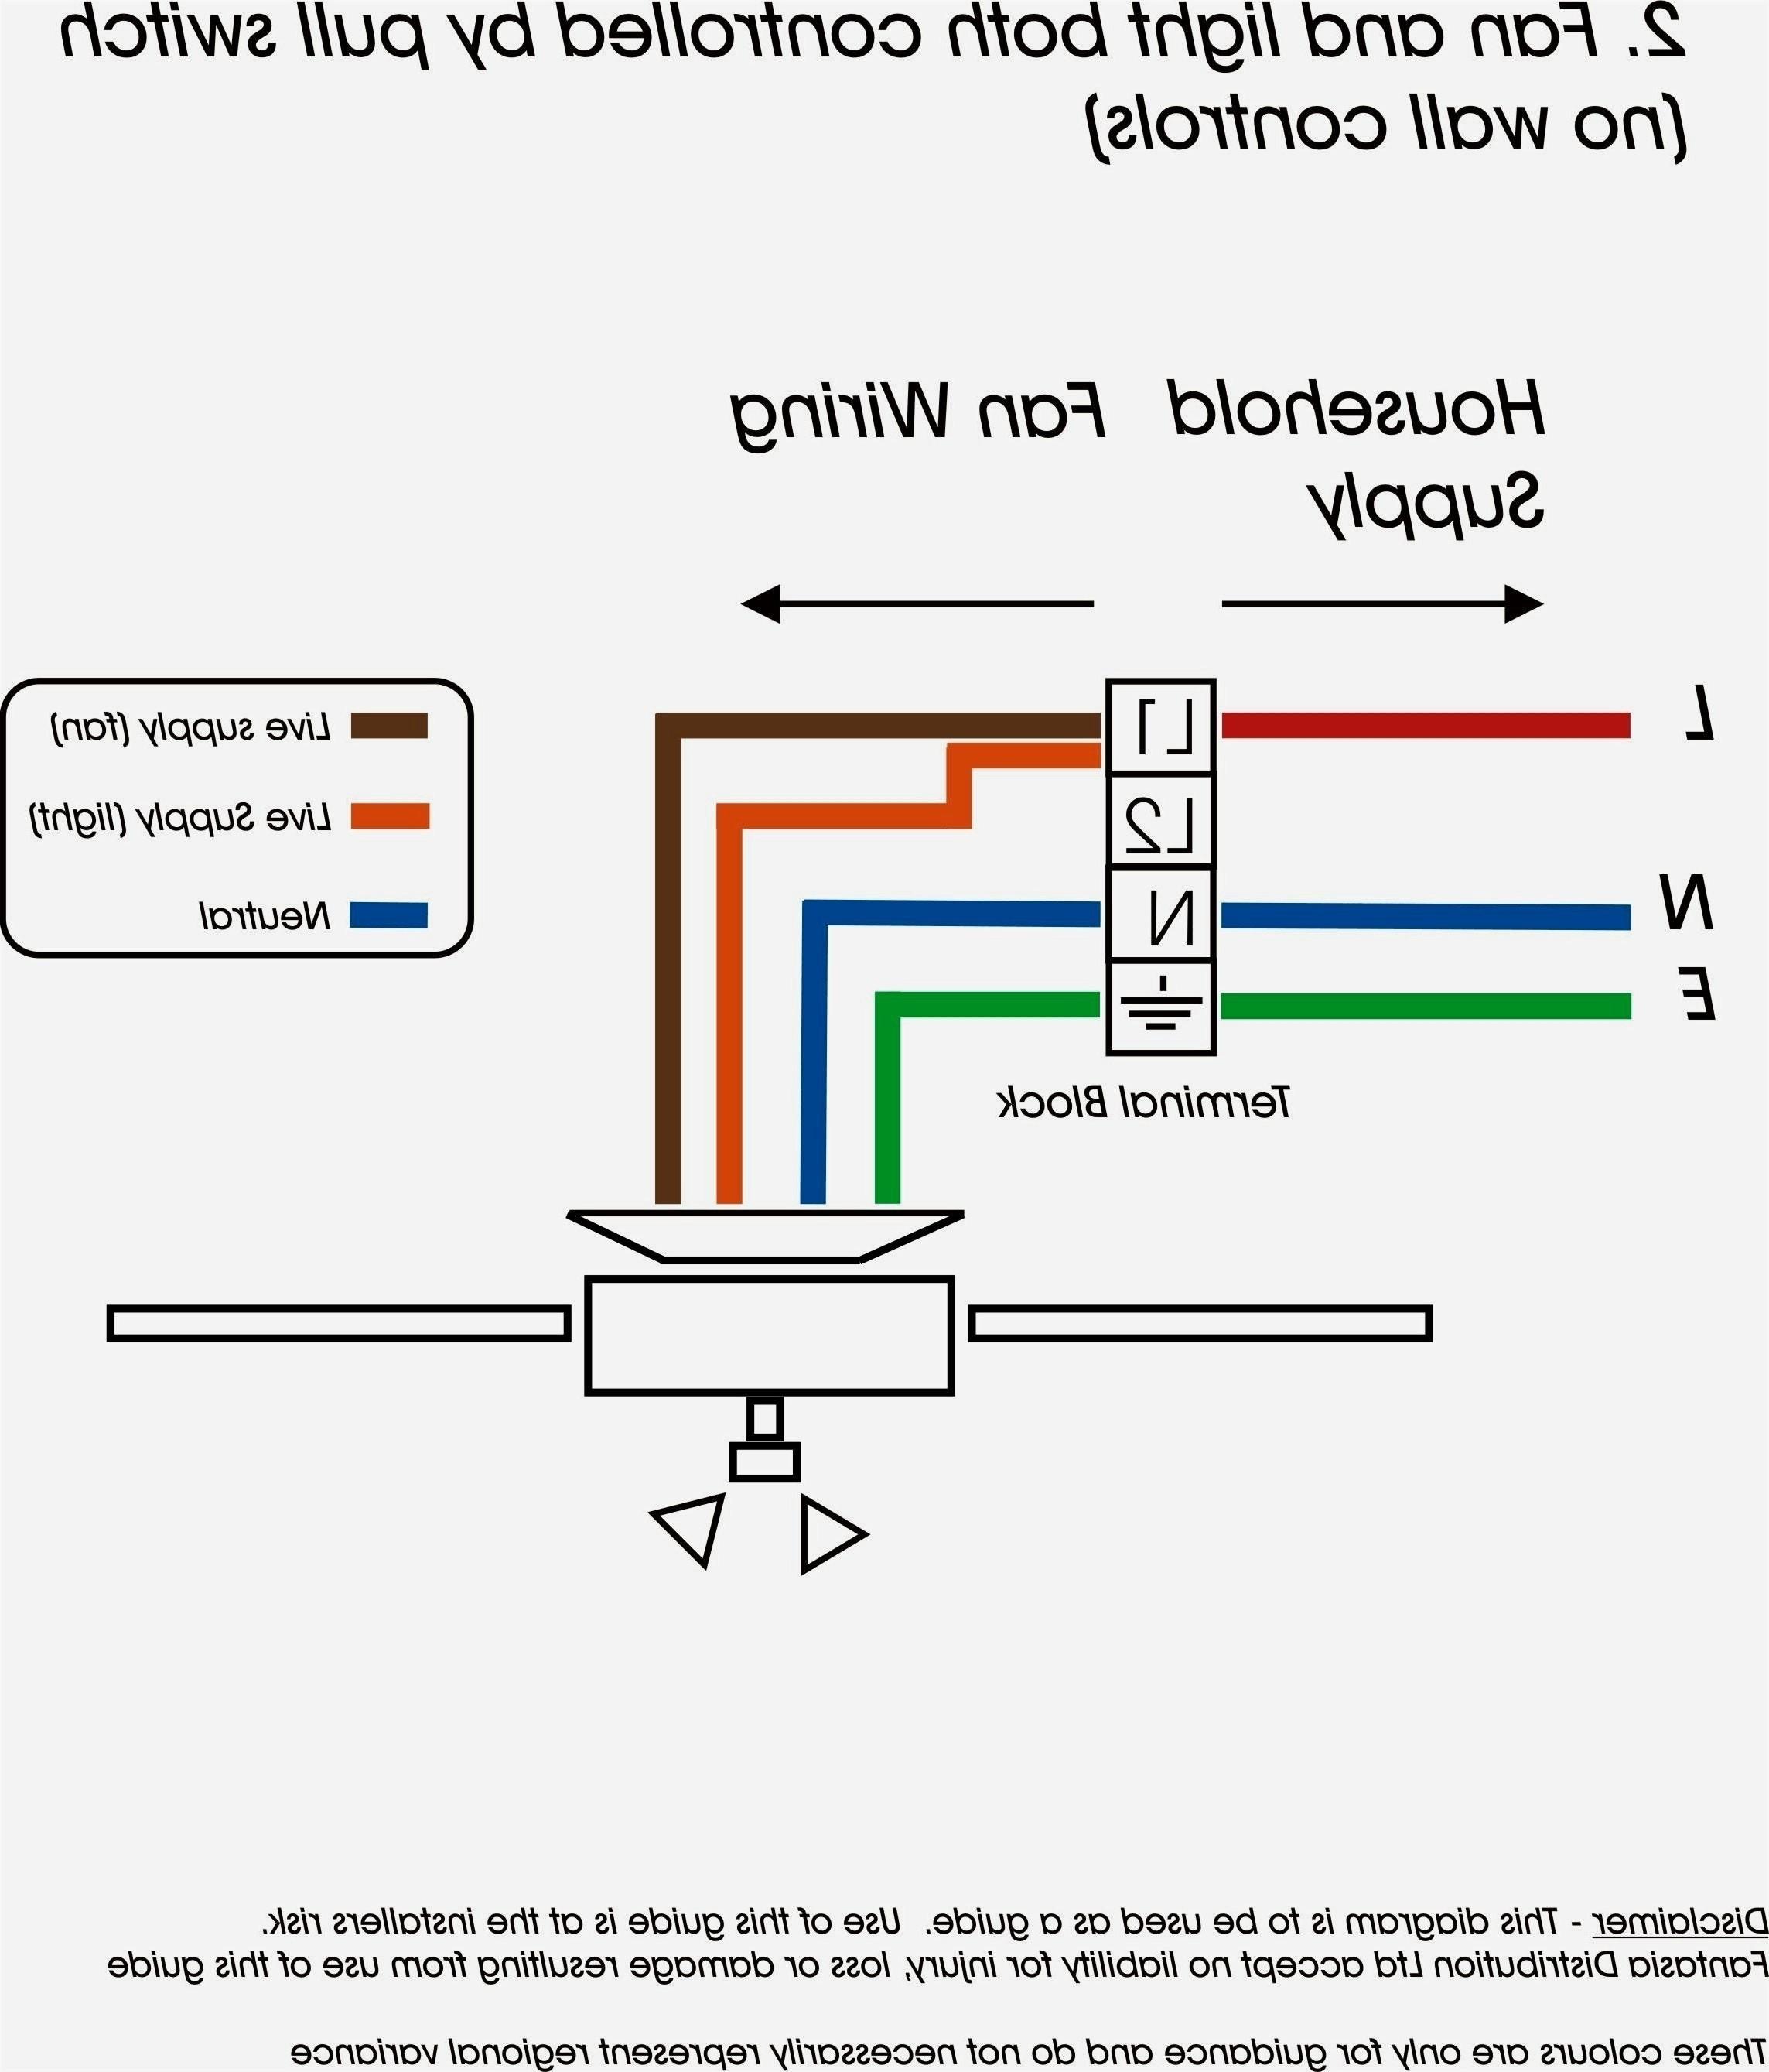 lithonia wiring diagrams wiring diagrams Micro Switch Wiring Diagram lithonia wall pack wiring diagram wiring diagramlithonium lighting wiring diagram lithonia led wiring diagramlithonia lighting wiring